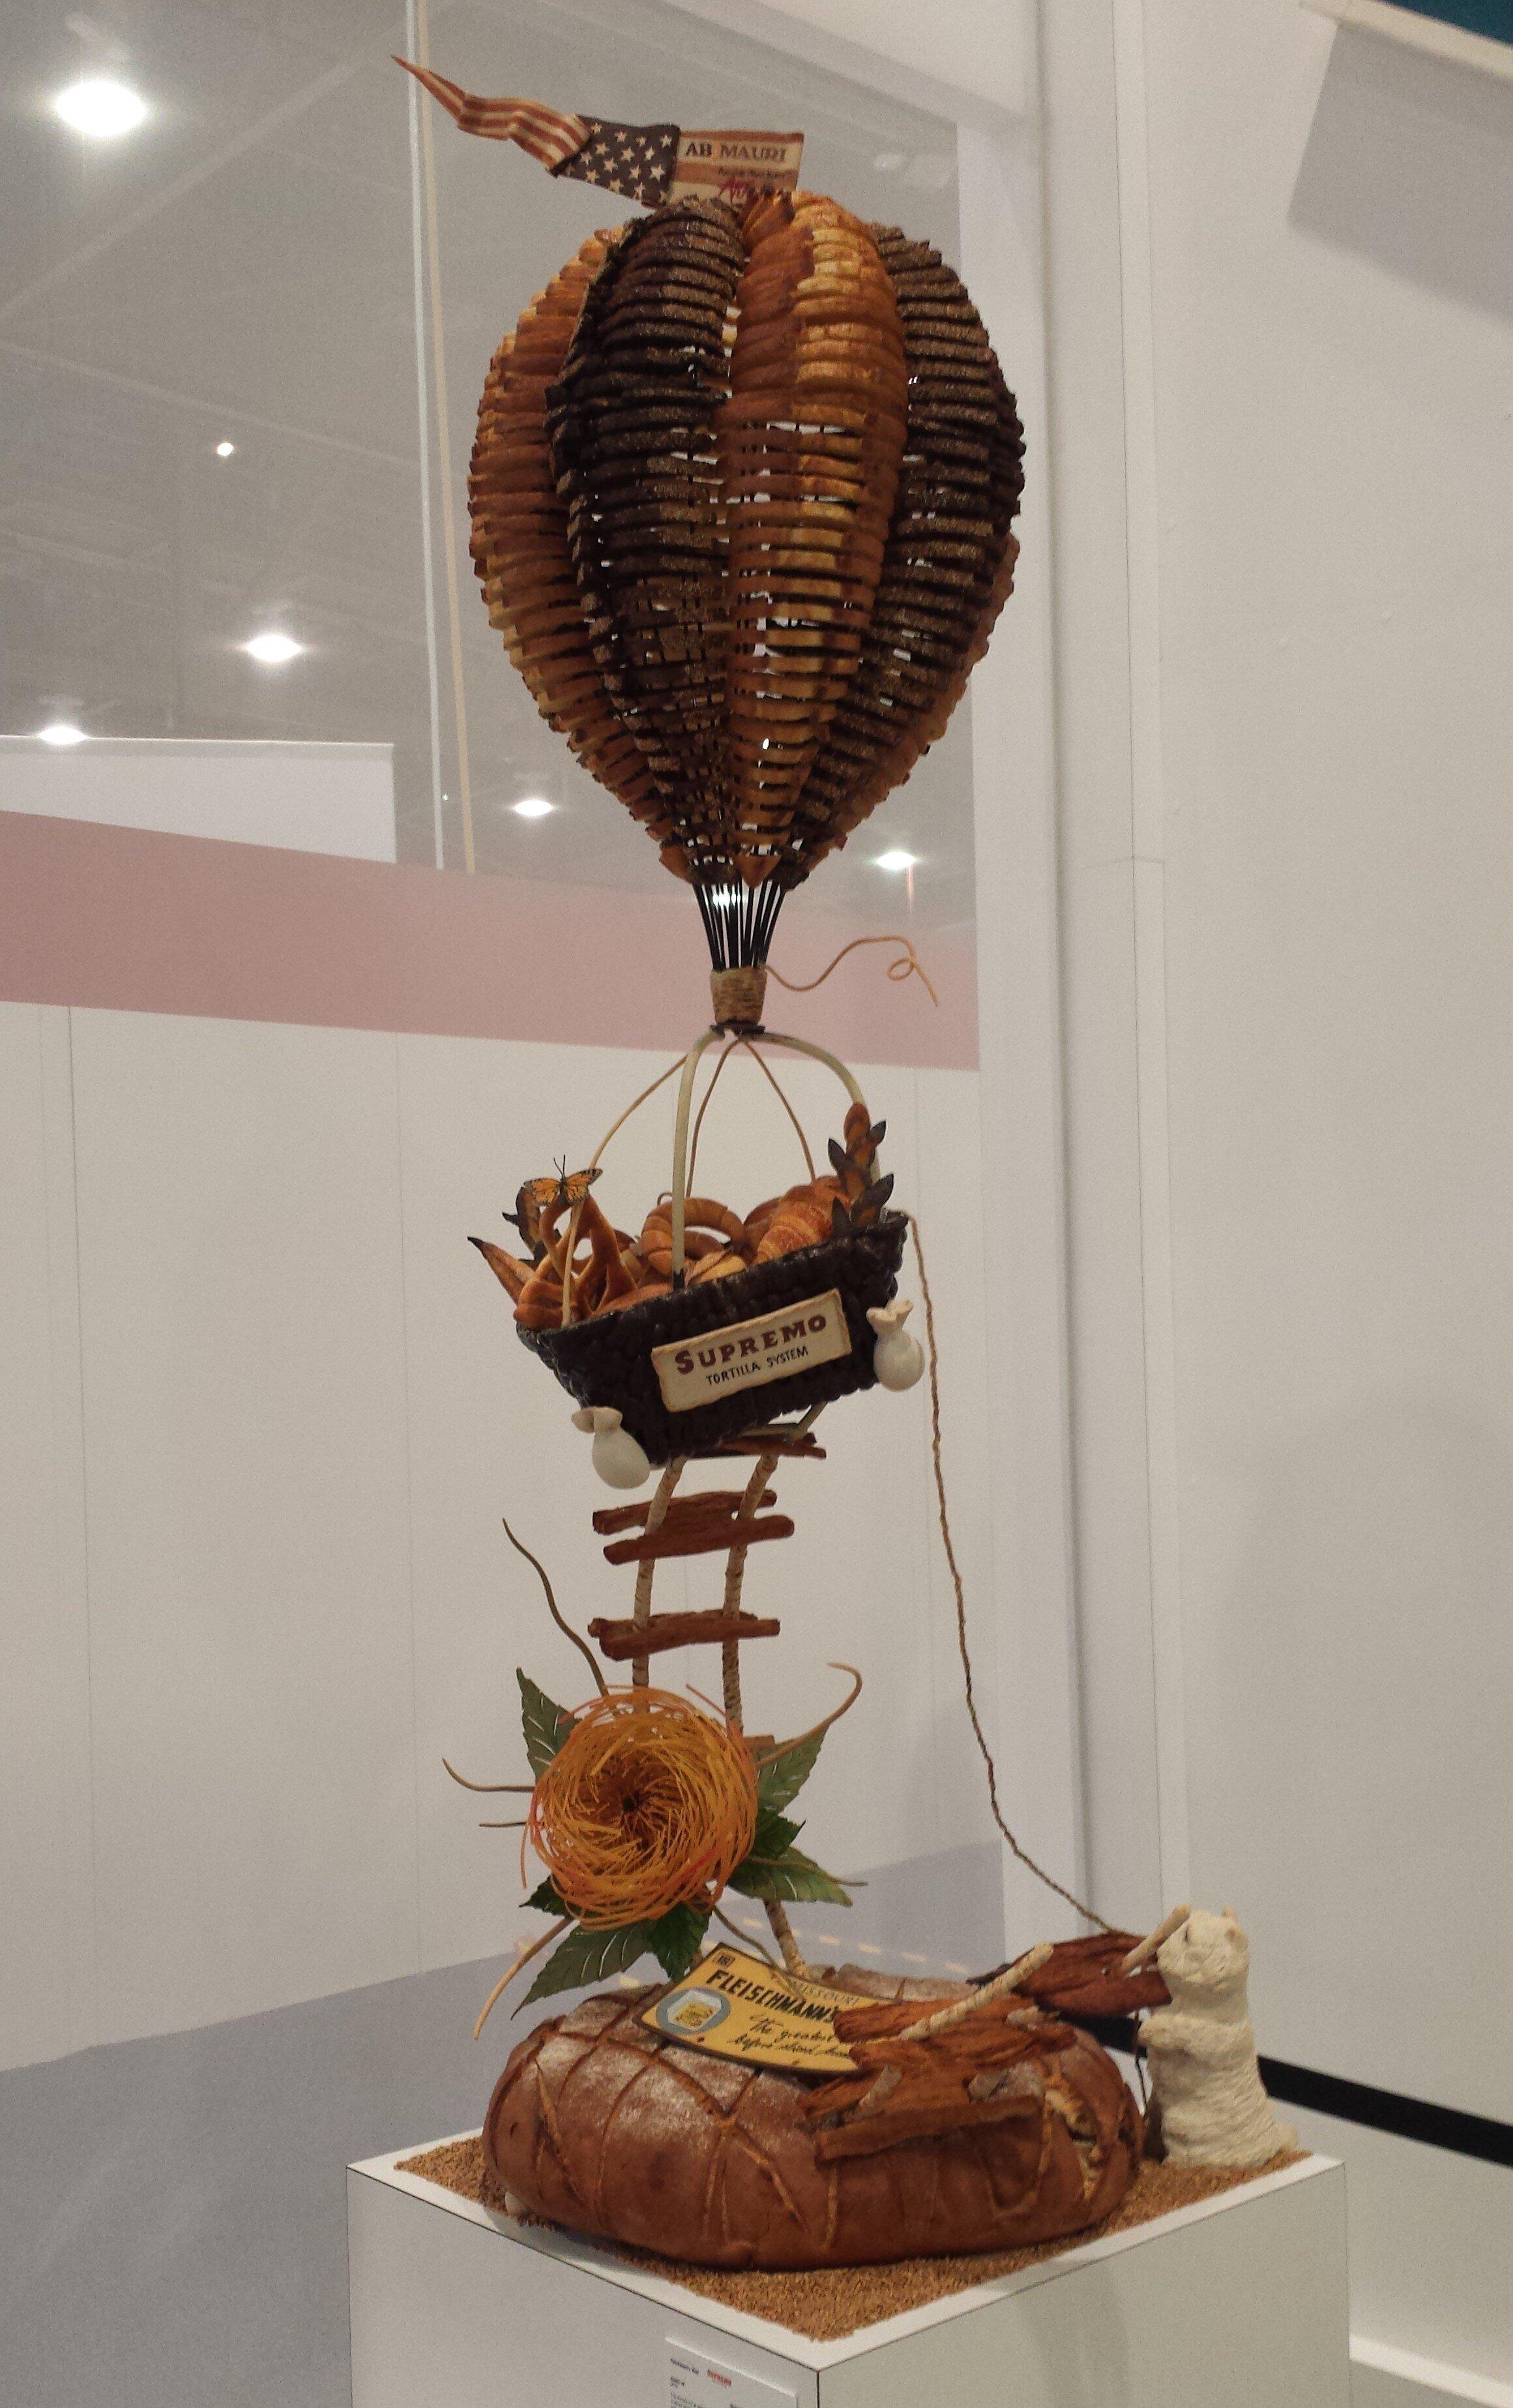 IBIE+Vegas+Harry+Bread+Sculpture.jpg